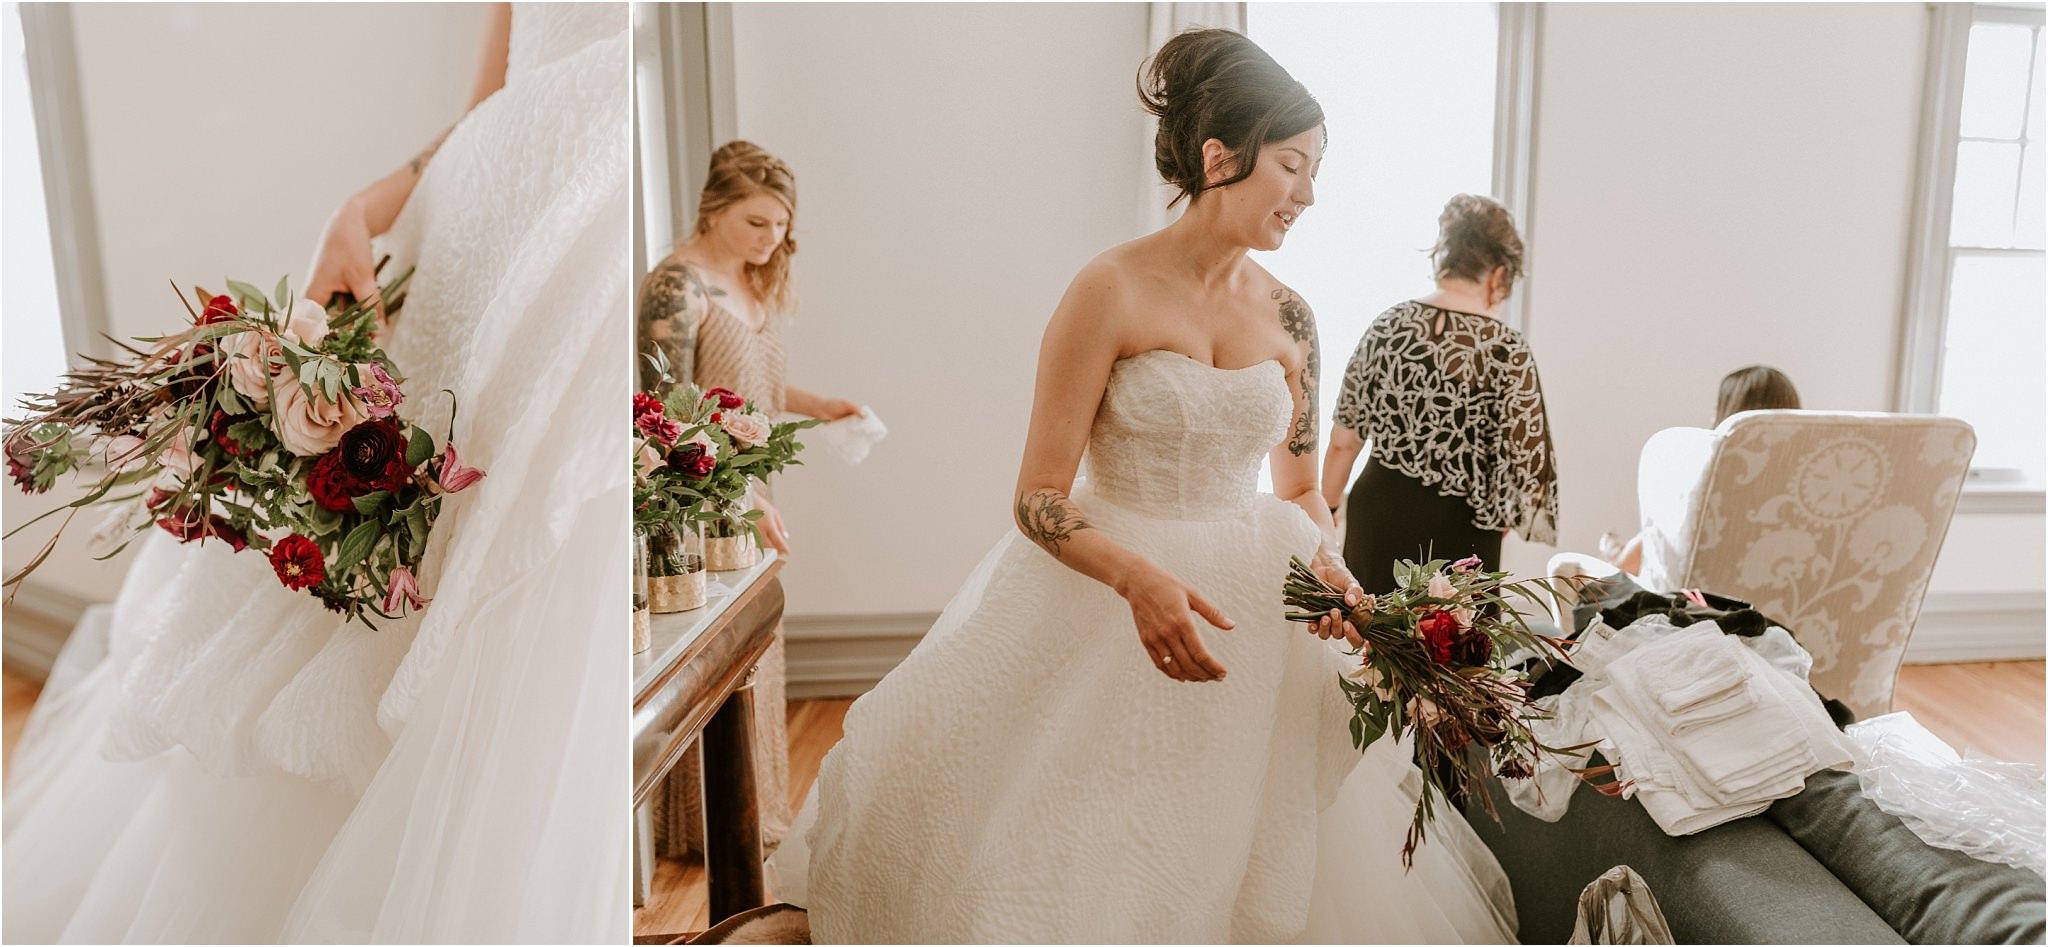 wedding,photographer,destination ,argentina,unatedstate, newyork,mauricio garay 5.jpg